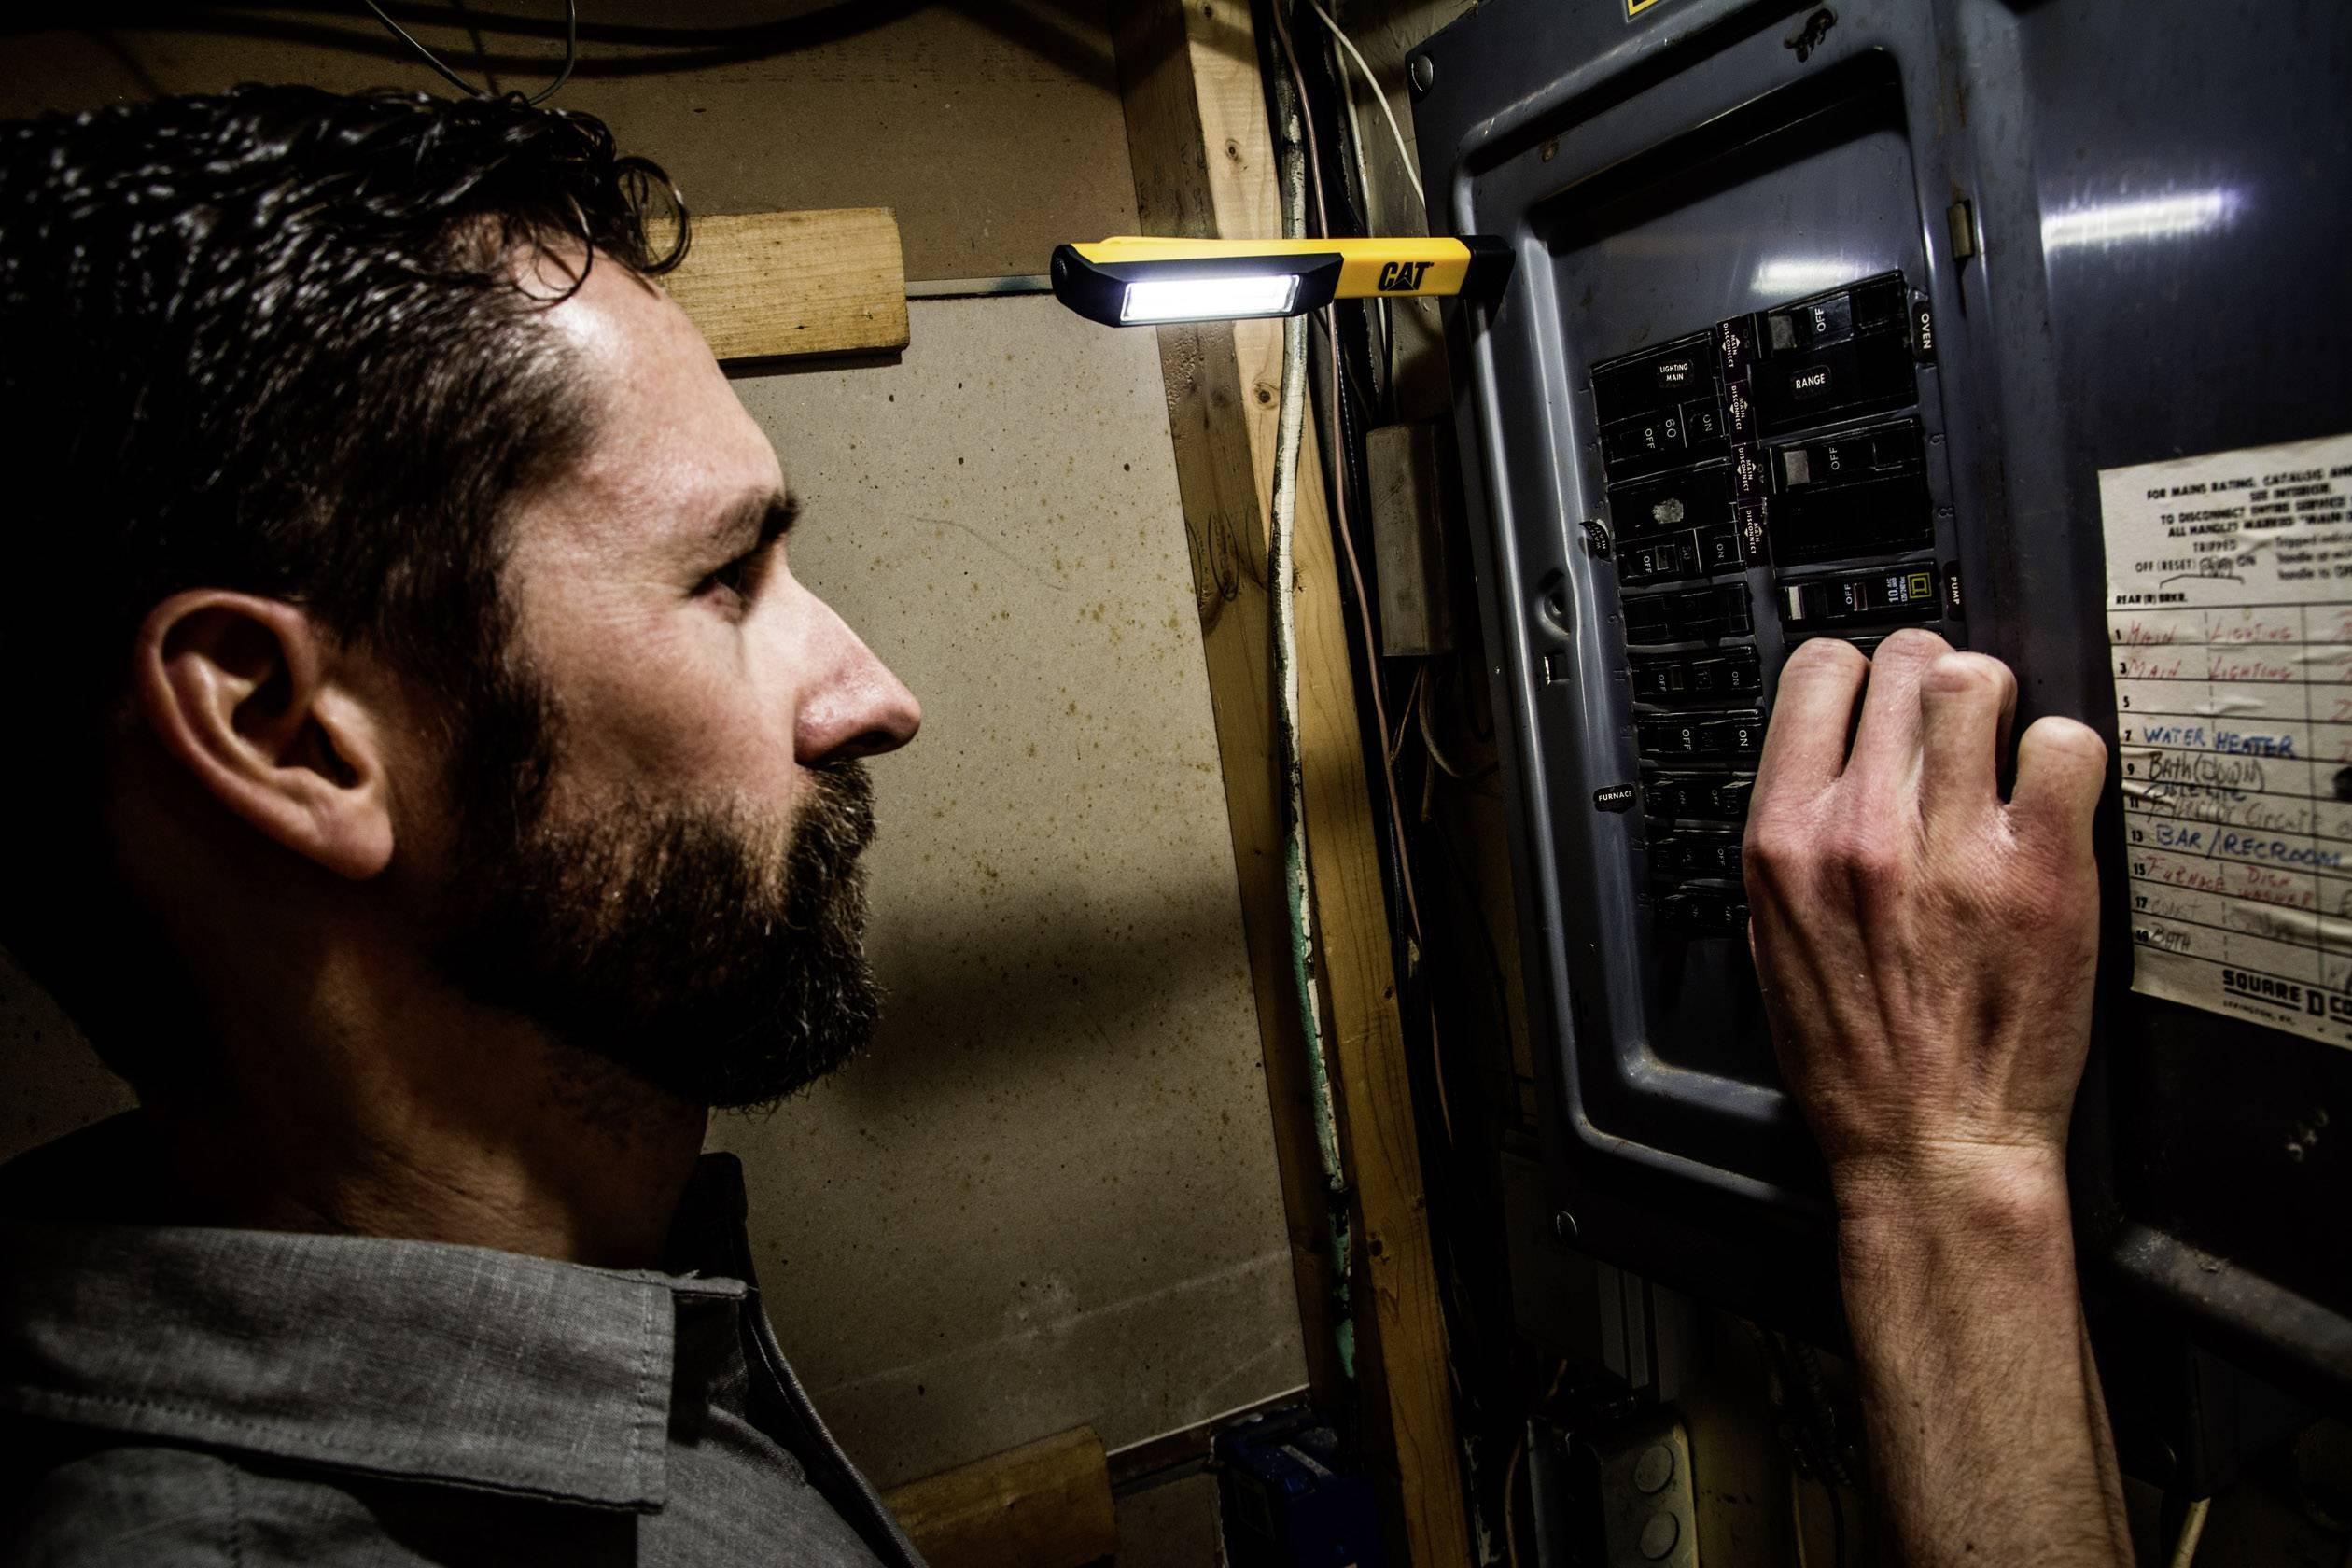 COB LED vreckové svietidlo (baterka) CAT CT1000 68 g, na batérie, čierna, žltá